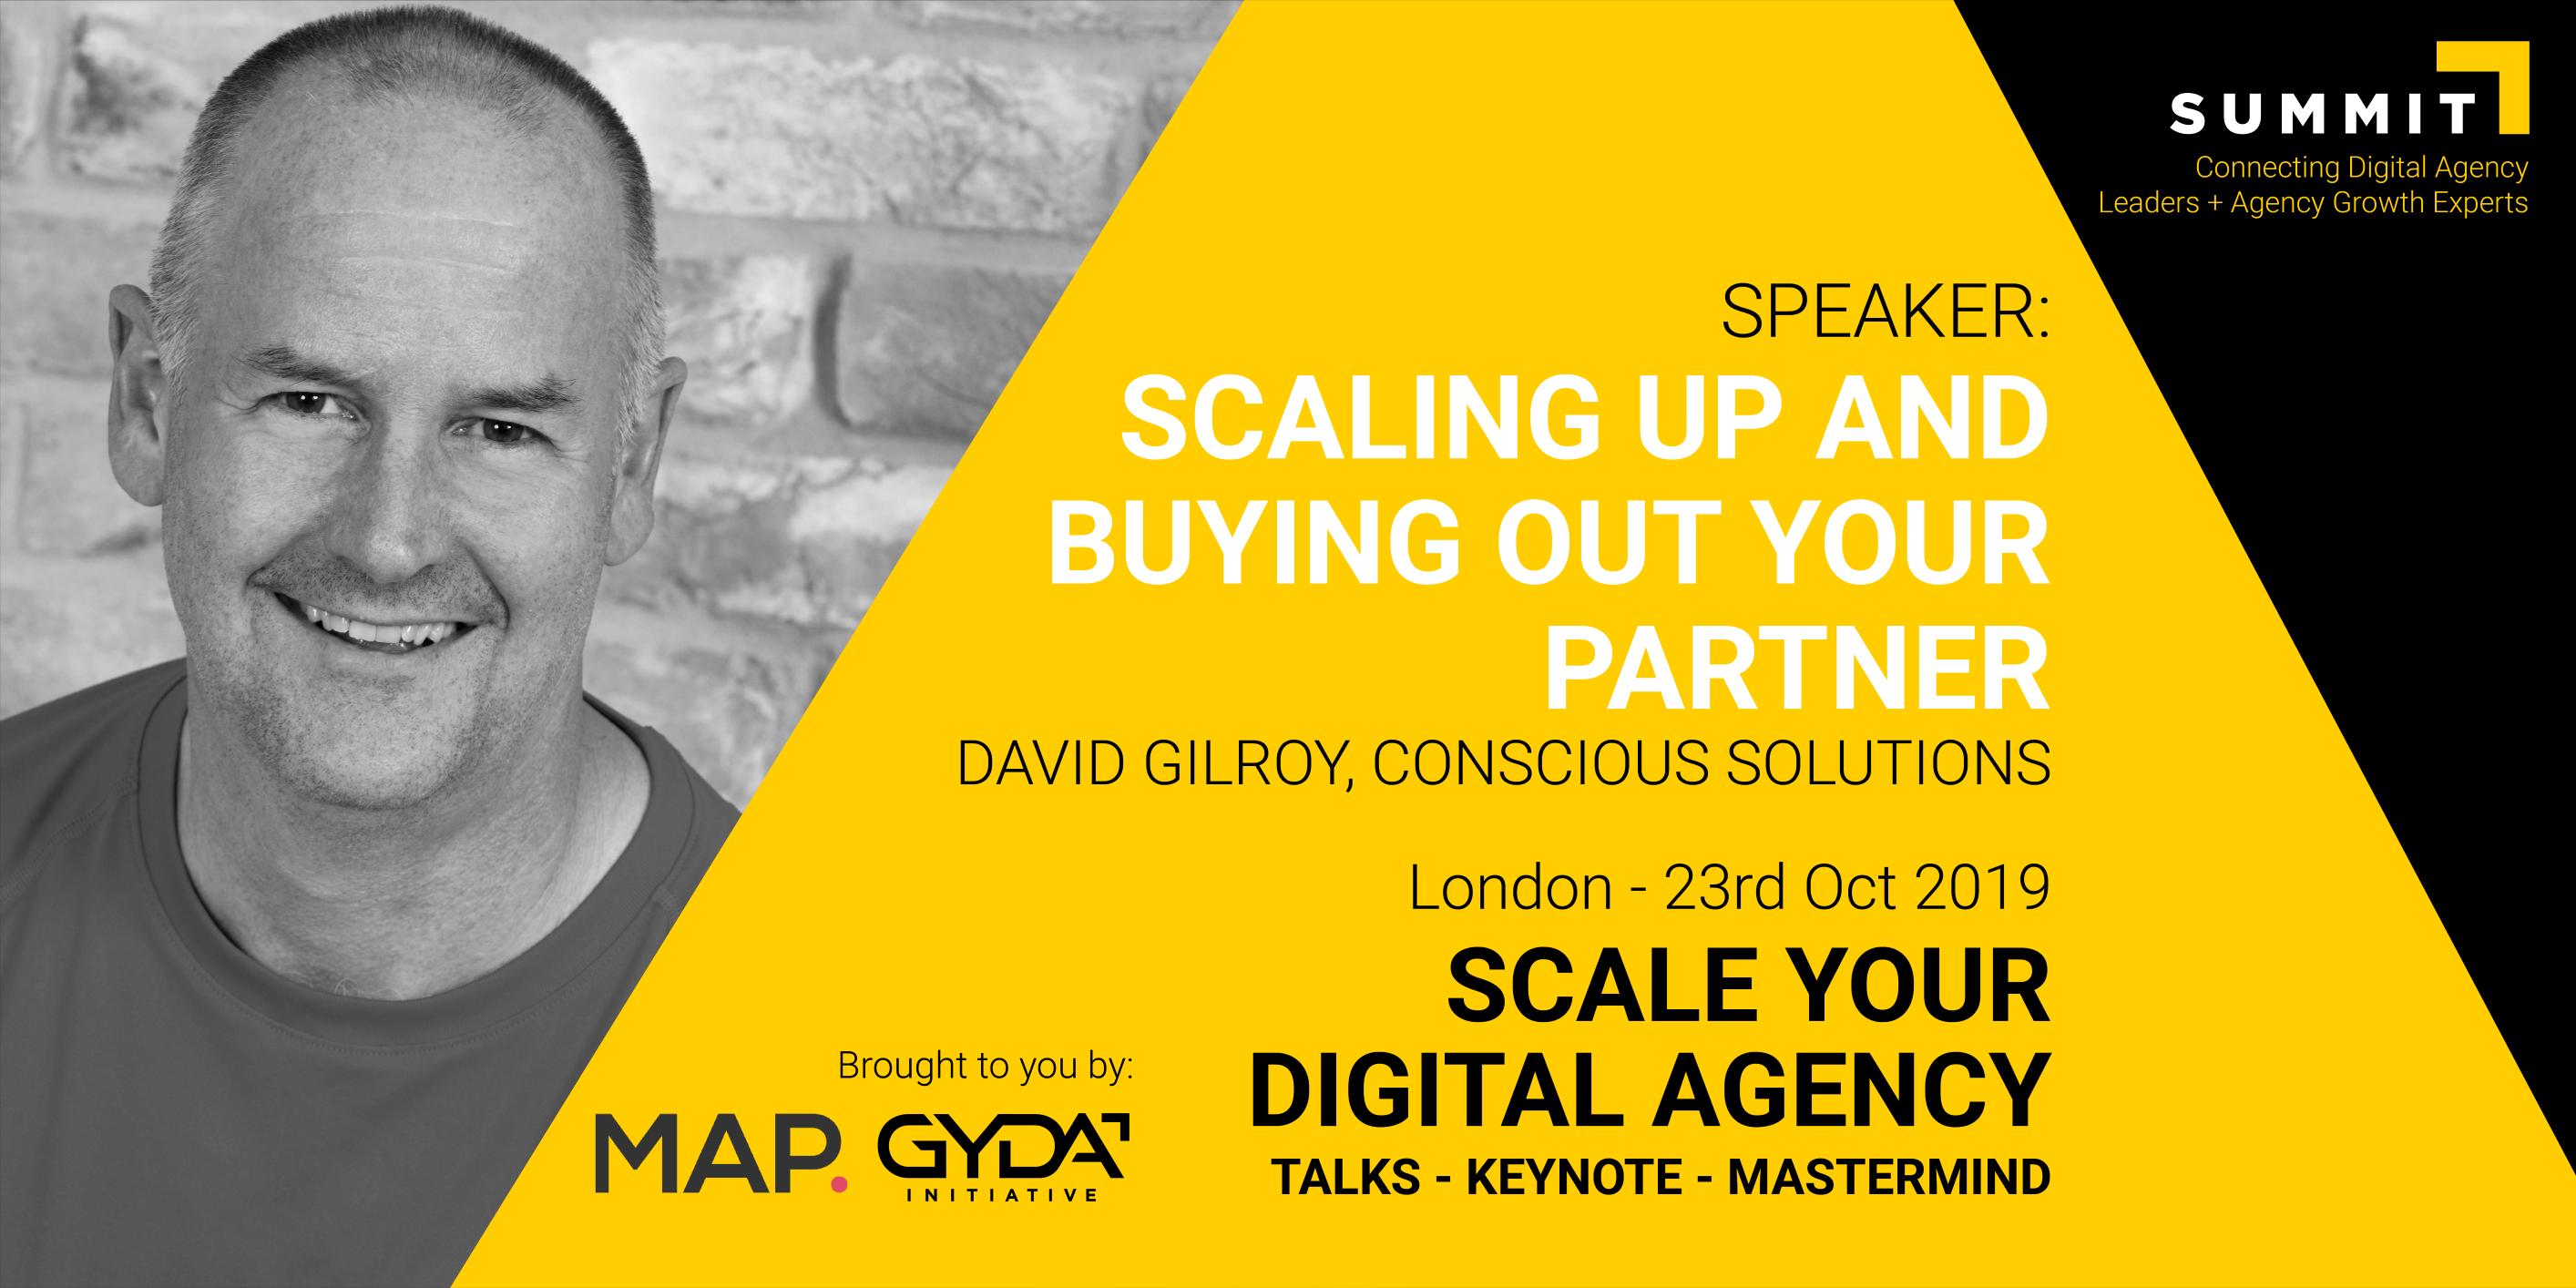 David Gilroy Speaker New